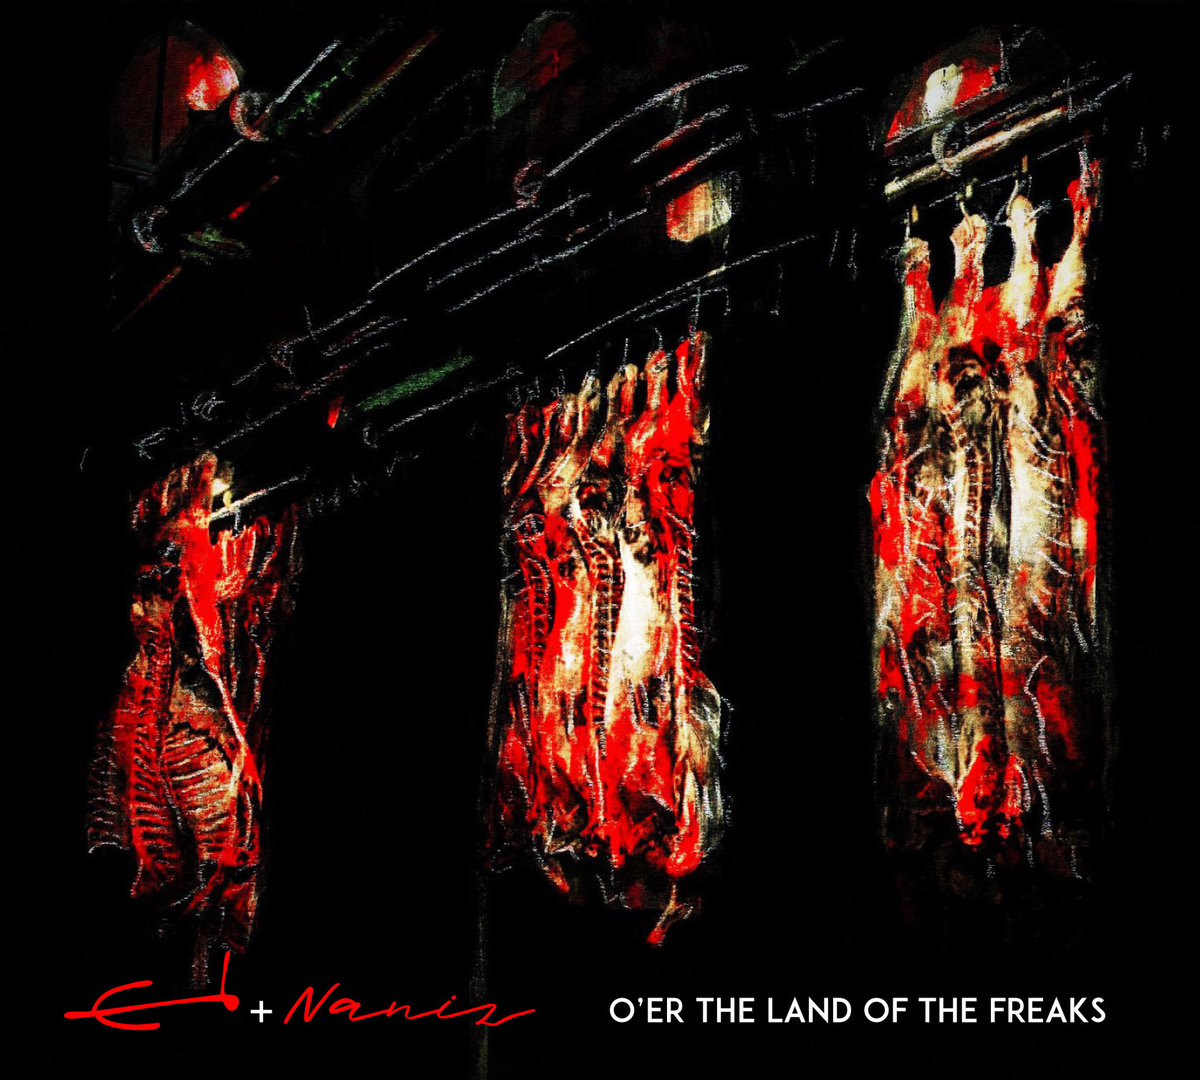 ESCLUSIVA: ENOMISOSSAB feat NANIZ O'ER THE LAND OF THE FREAKS 6 - fanzine